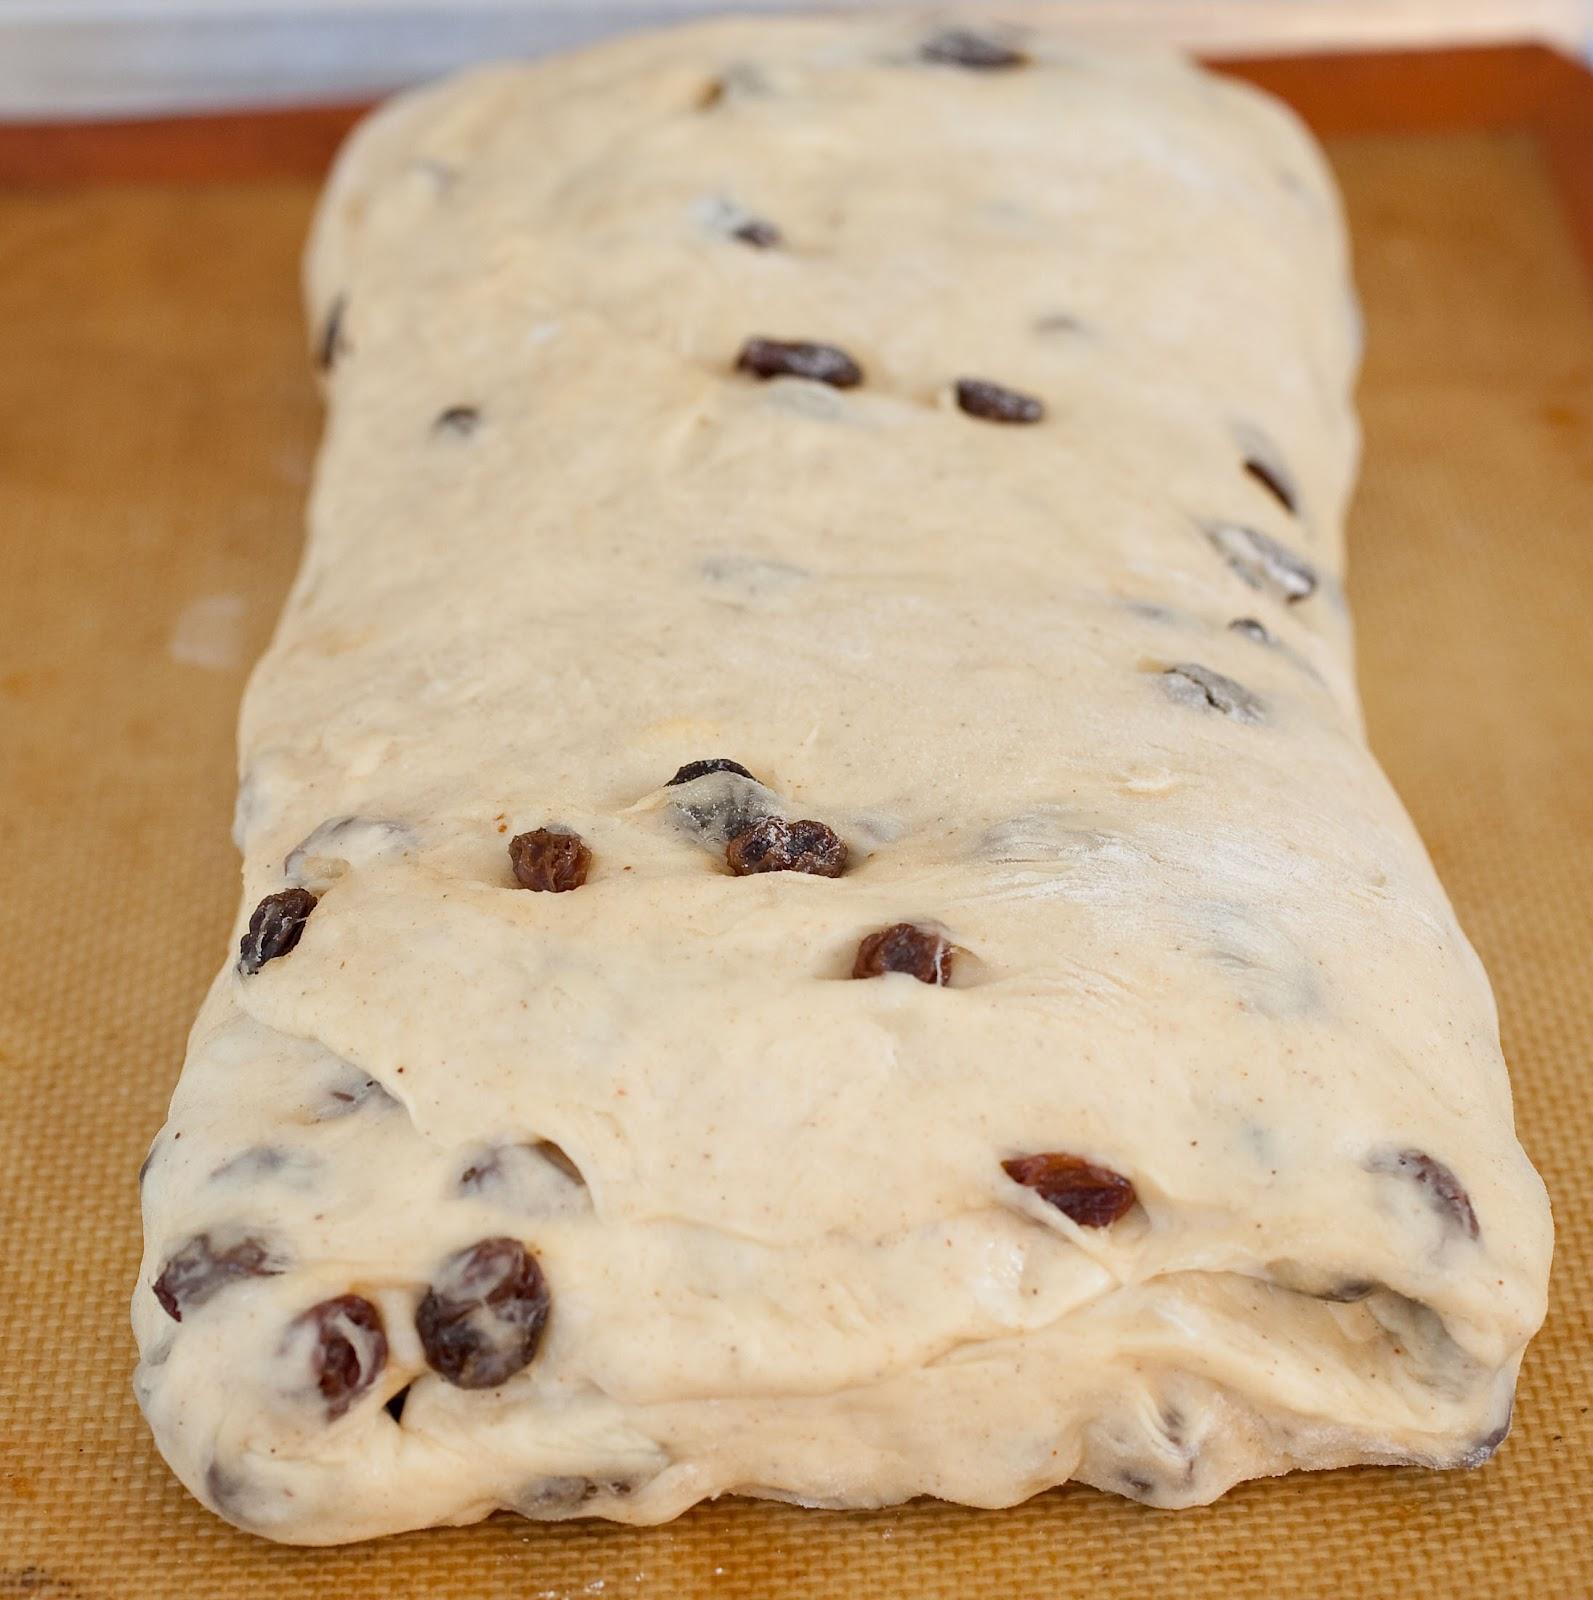 Tish Boyle Sweet Dreams: Cinnamon Raisin Twists from Amy's Bread